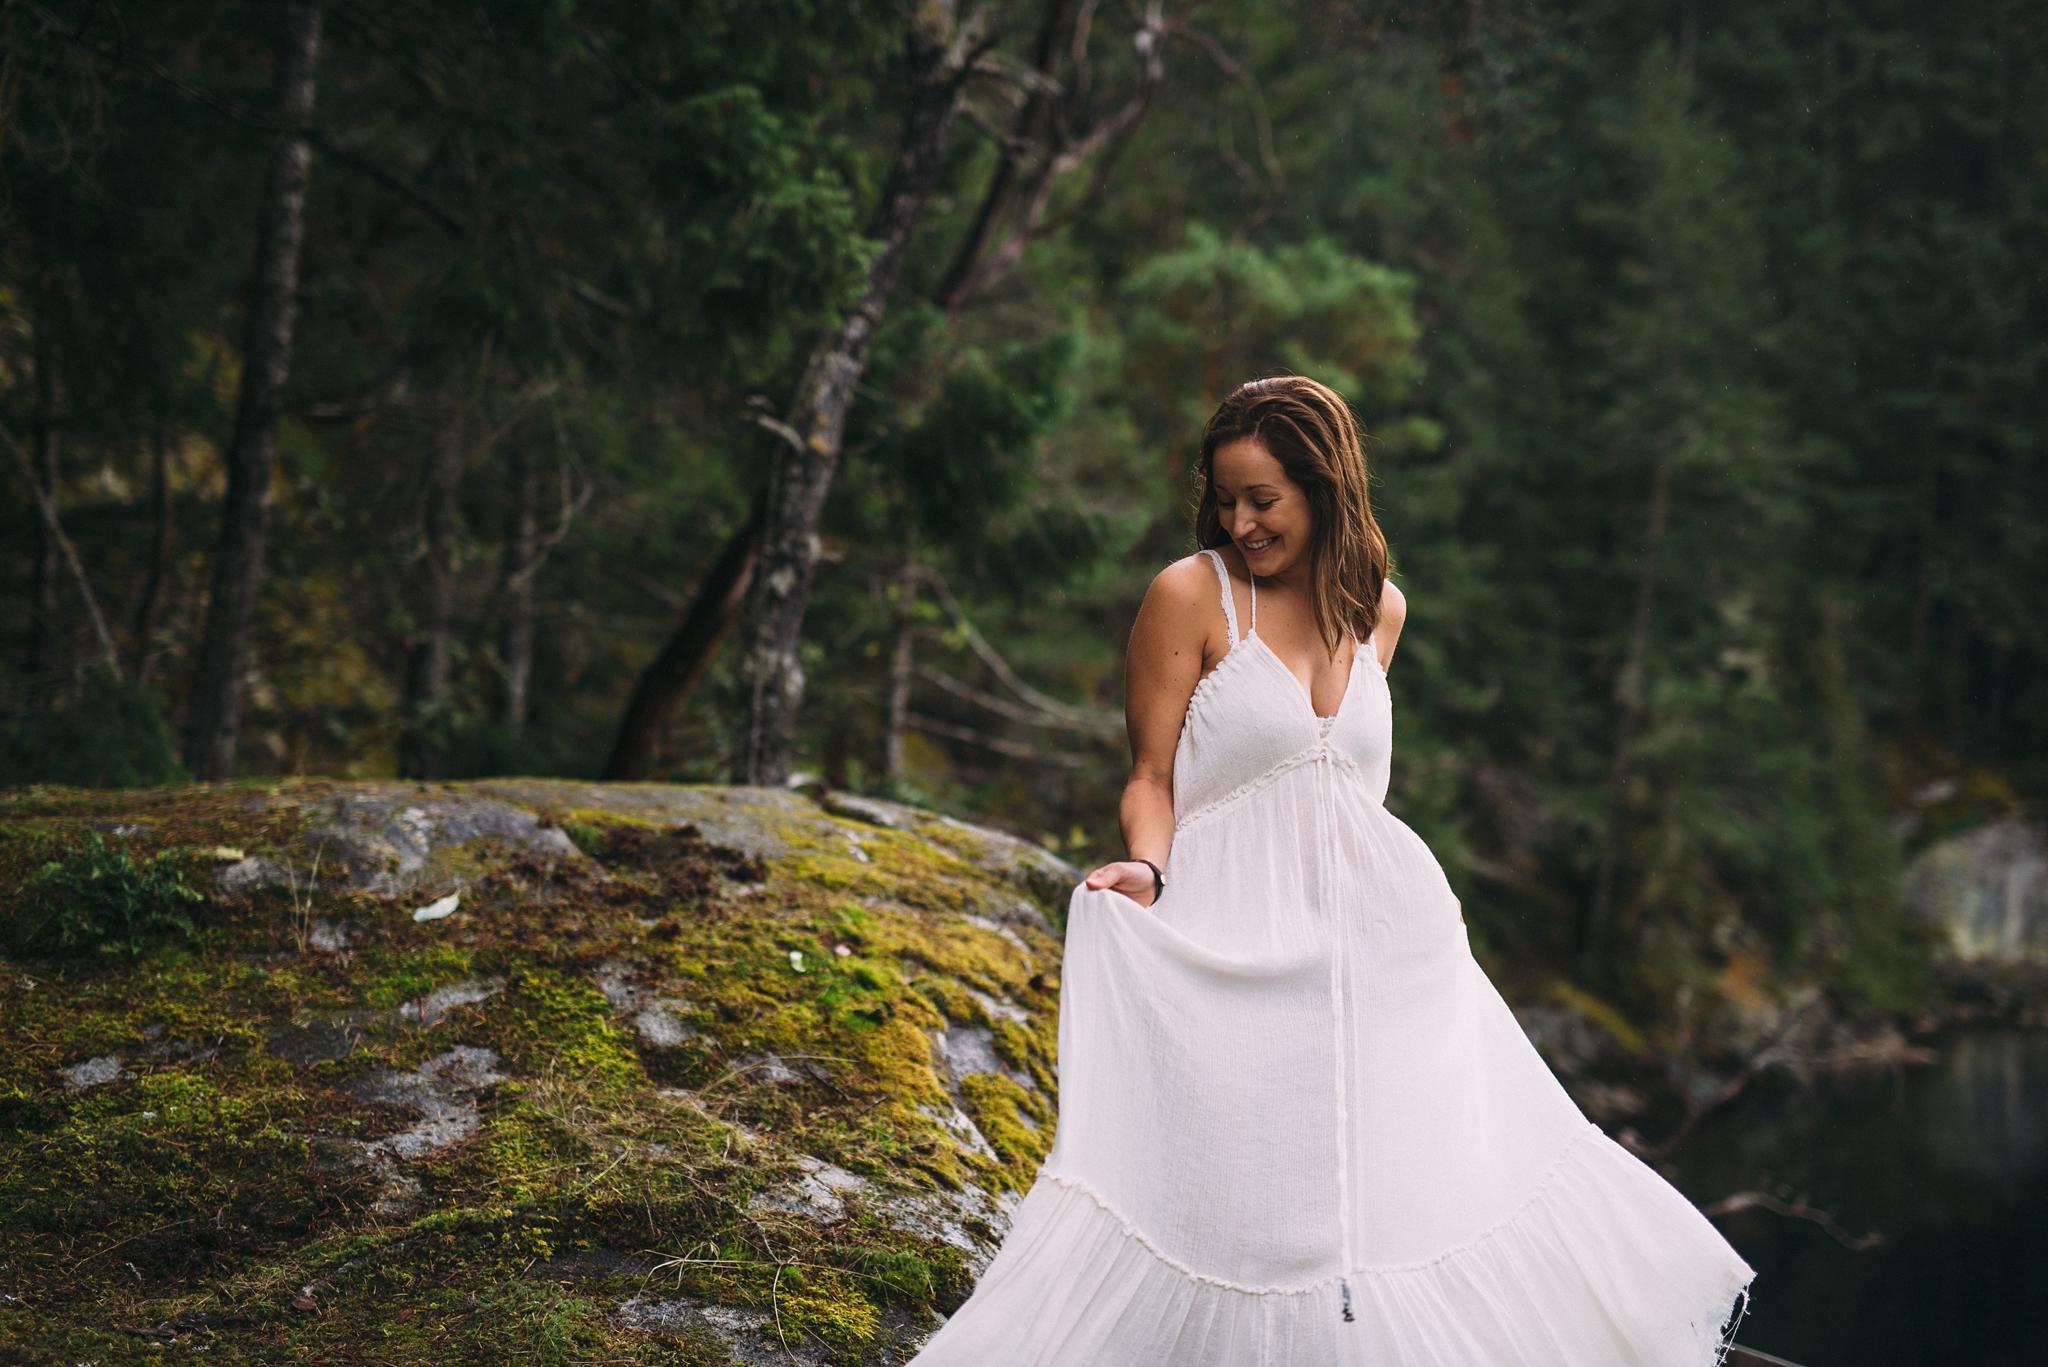 kaihla_tonai_intimate_wedding_elopement_photographer_3385